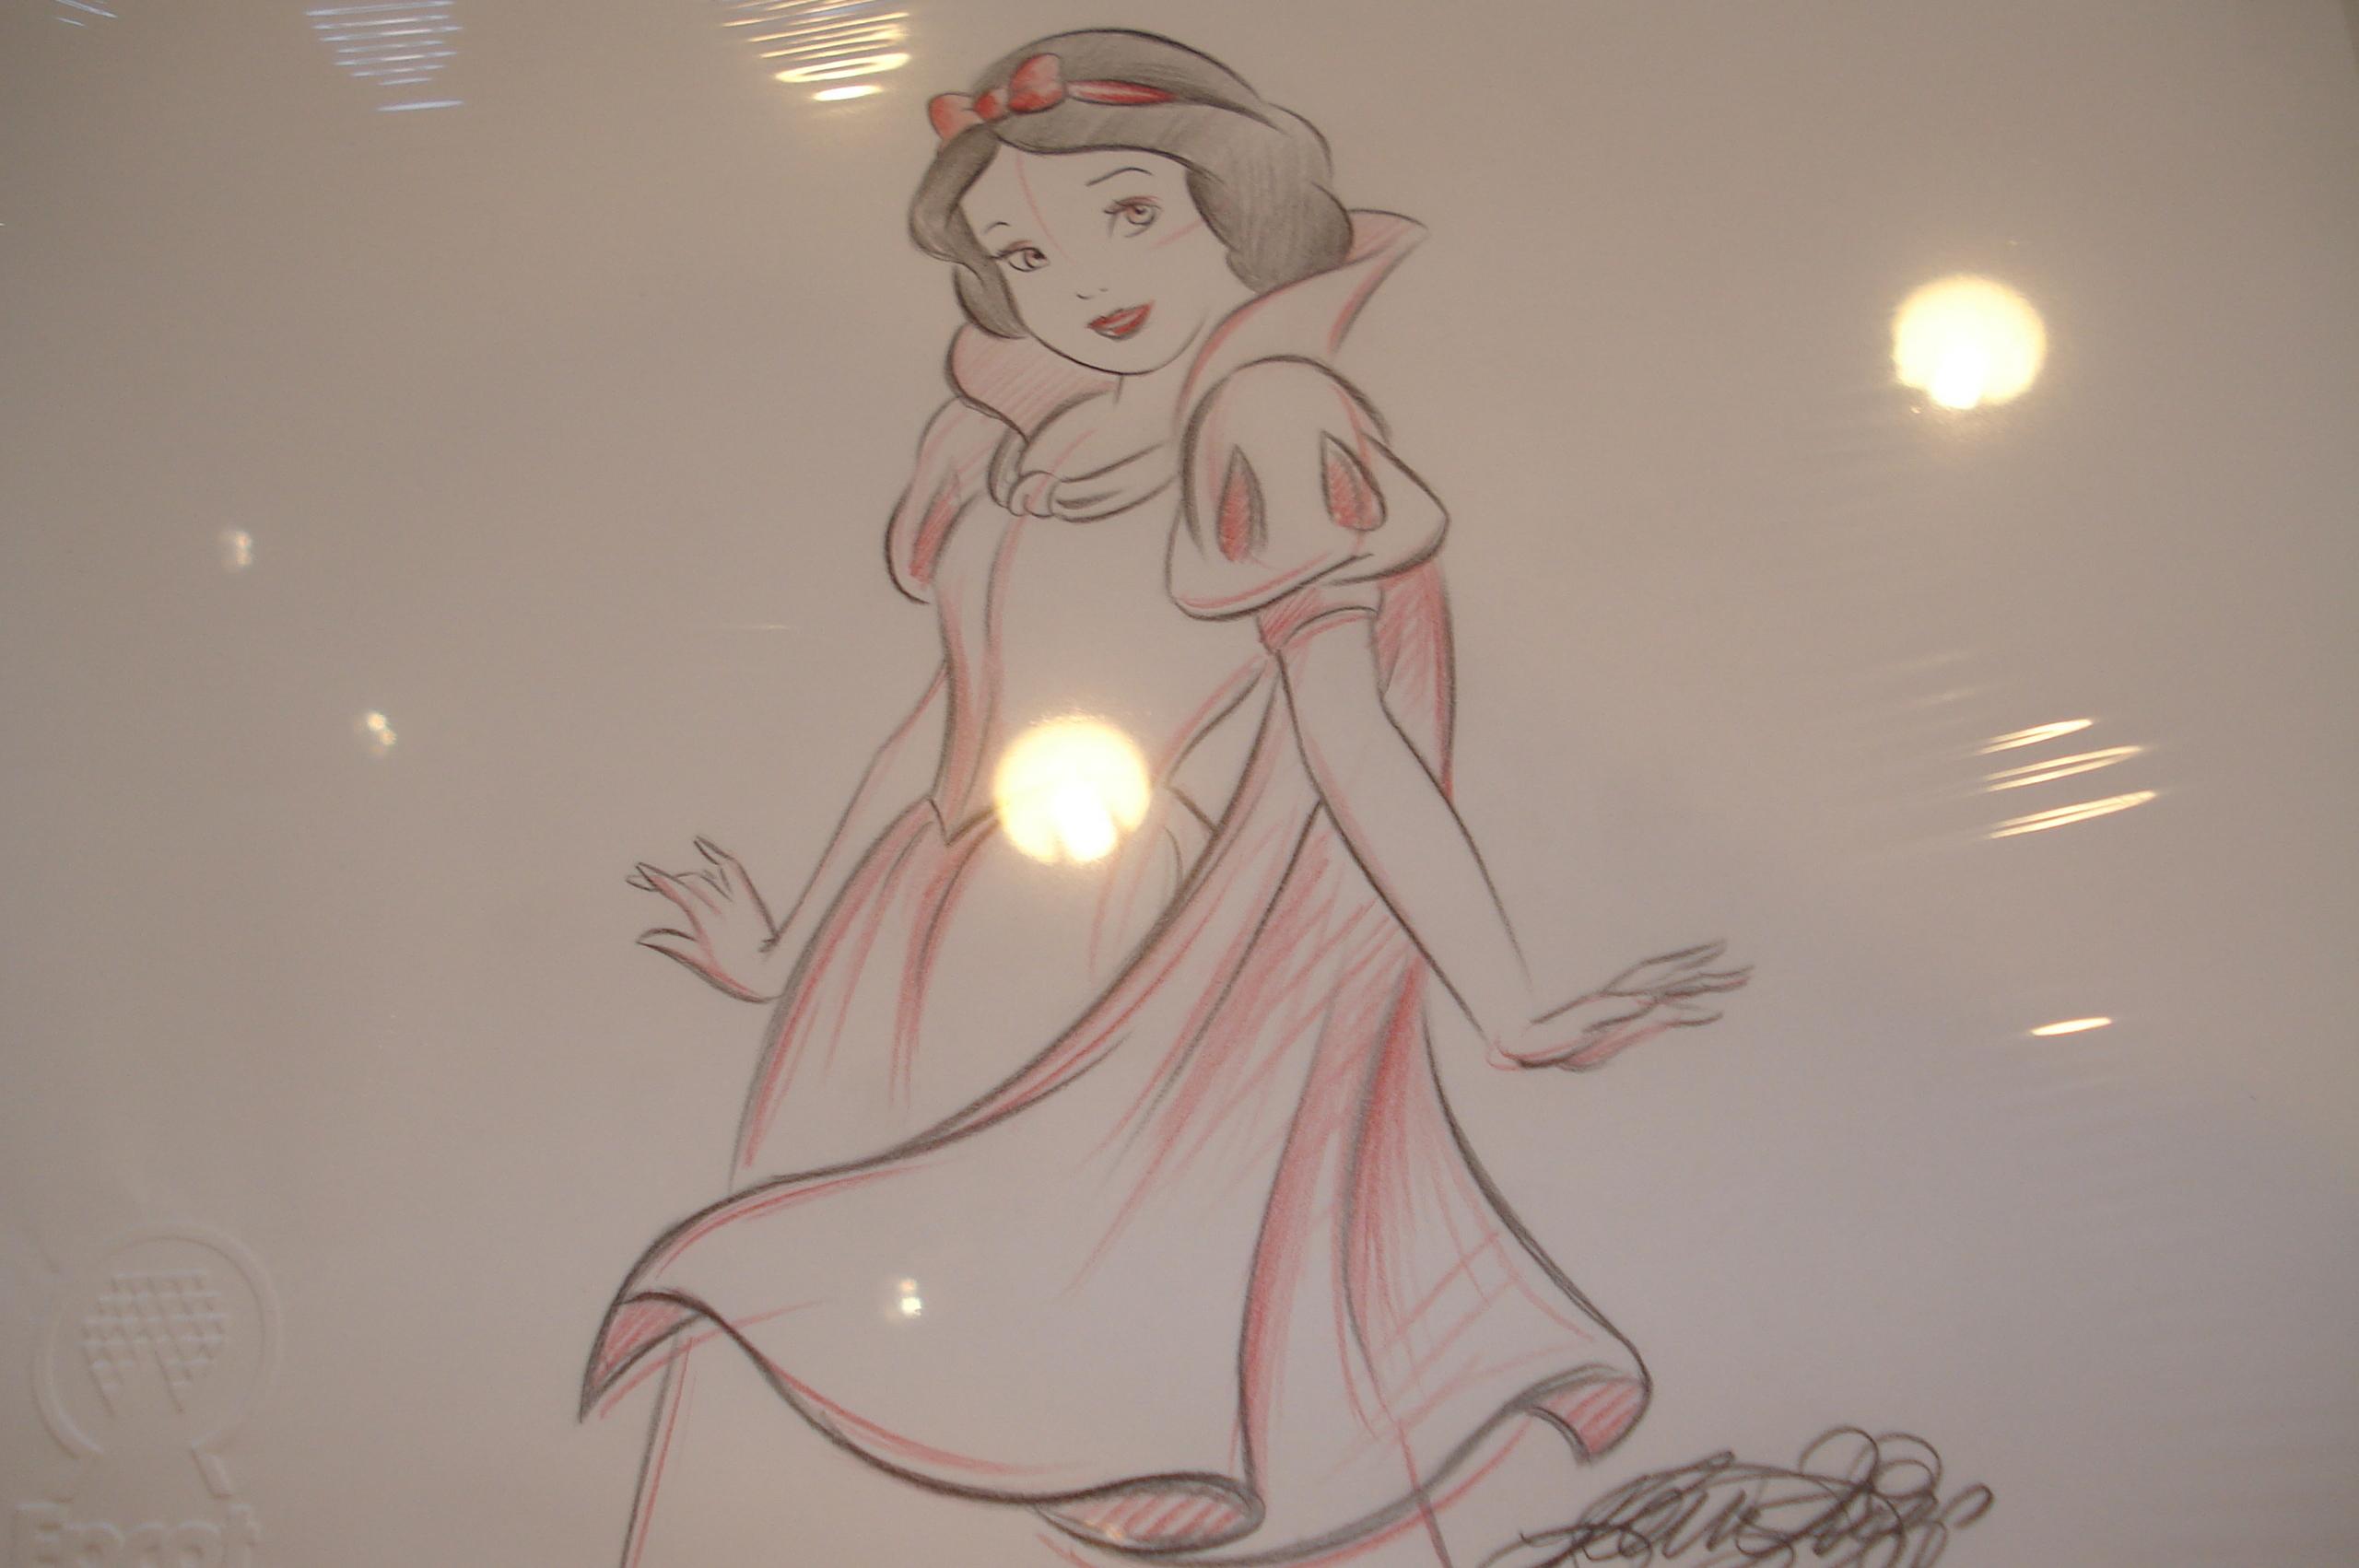 Disney Princess images...